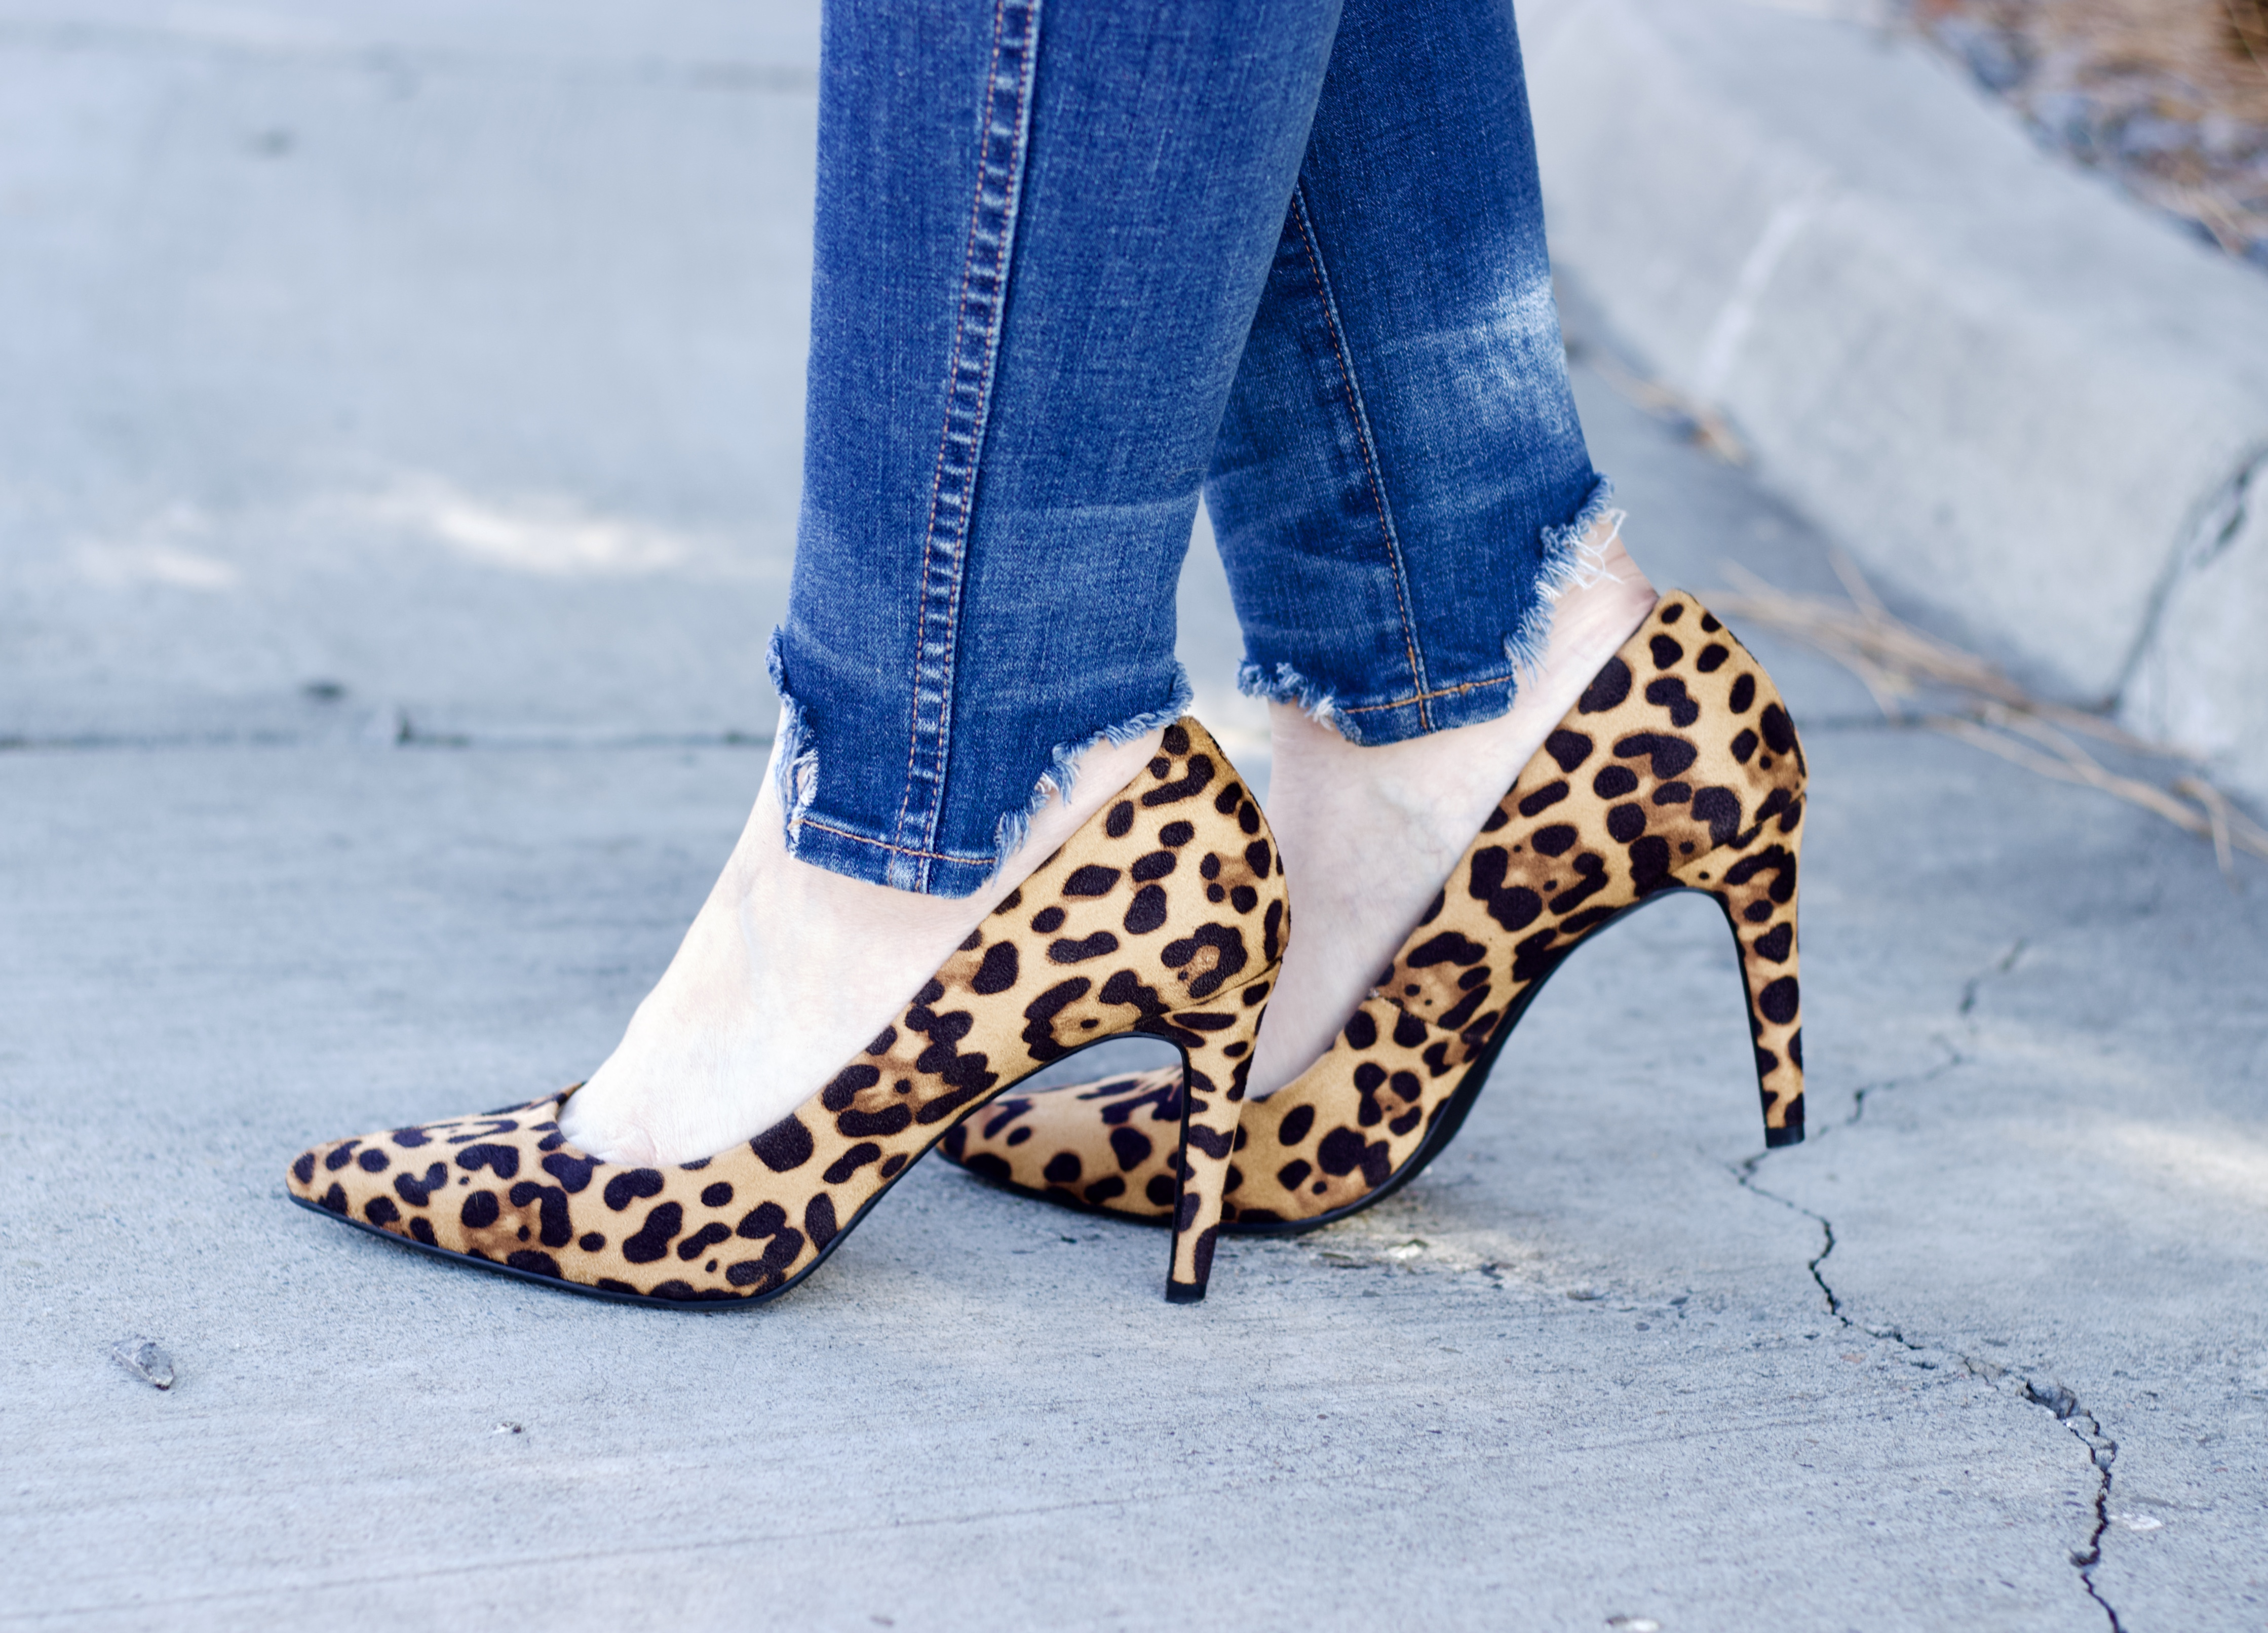 perfect leopard pumps #leopardheels #datenight #datenightstyle